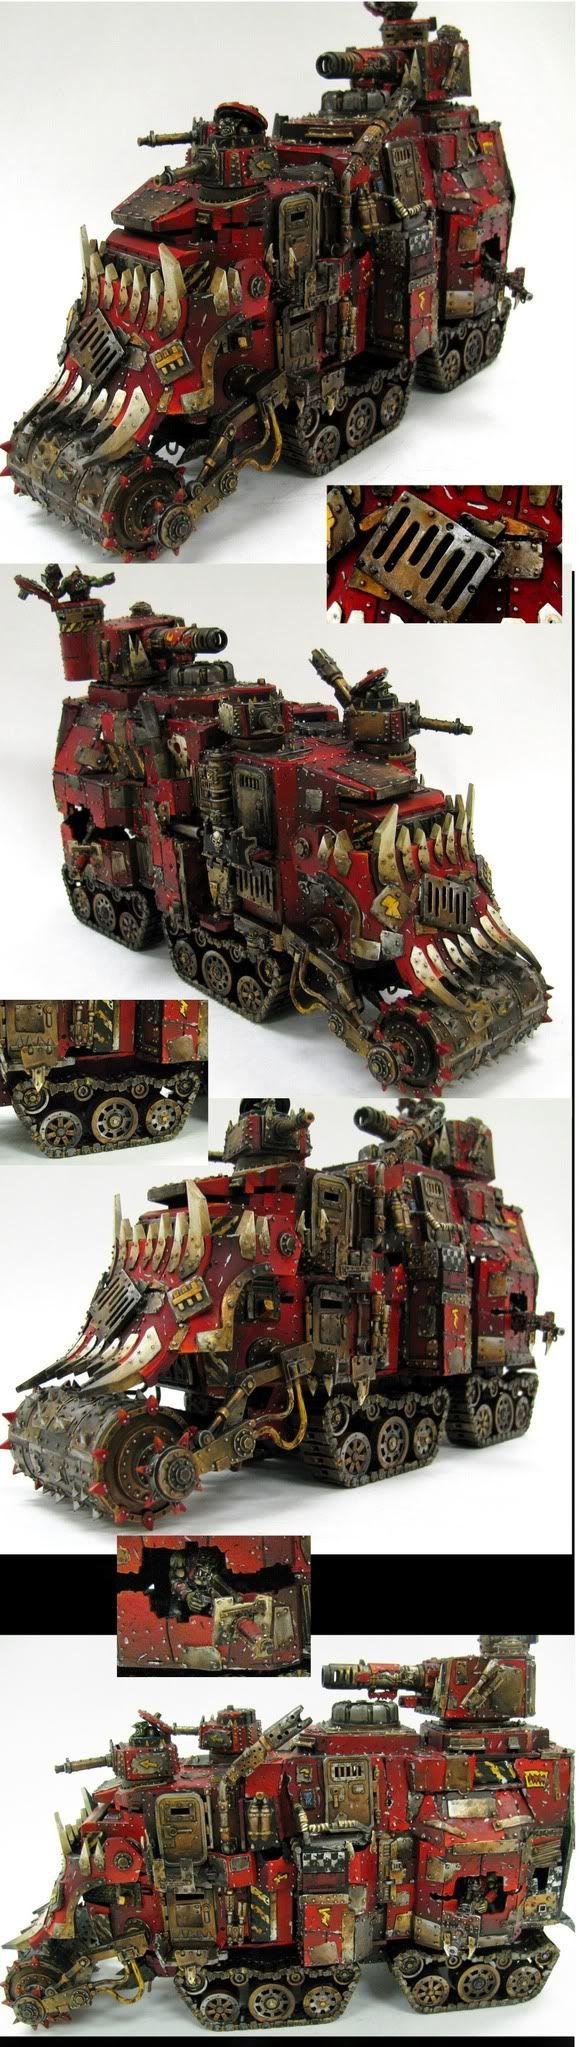 Ork double decker battlewagon/conversion